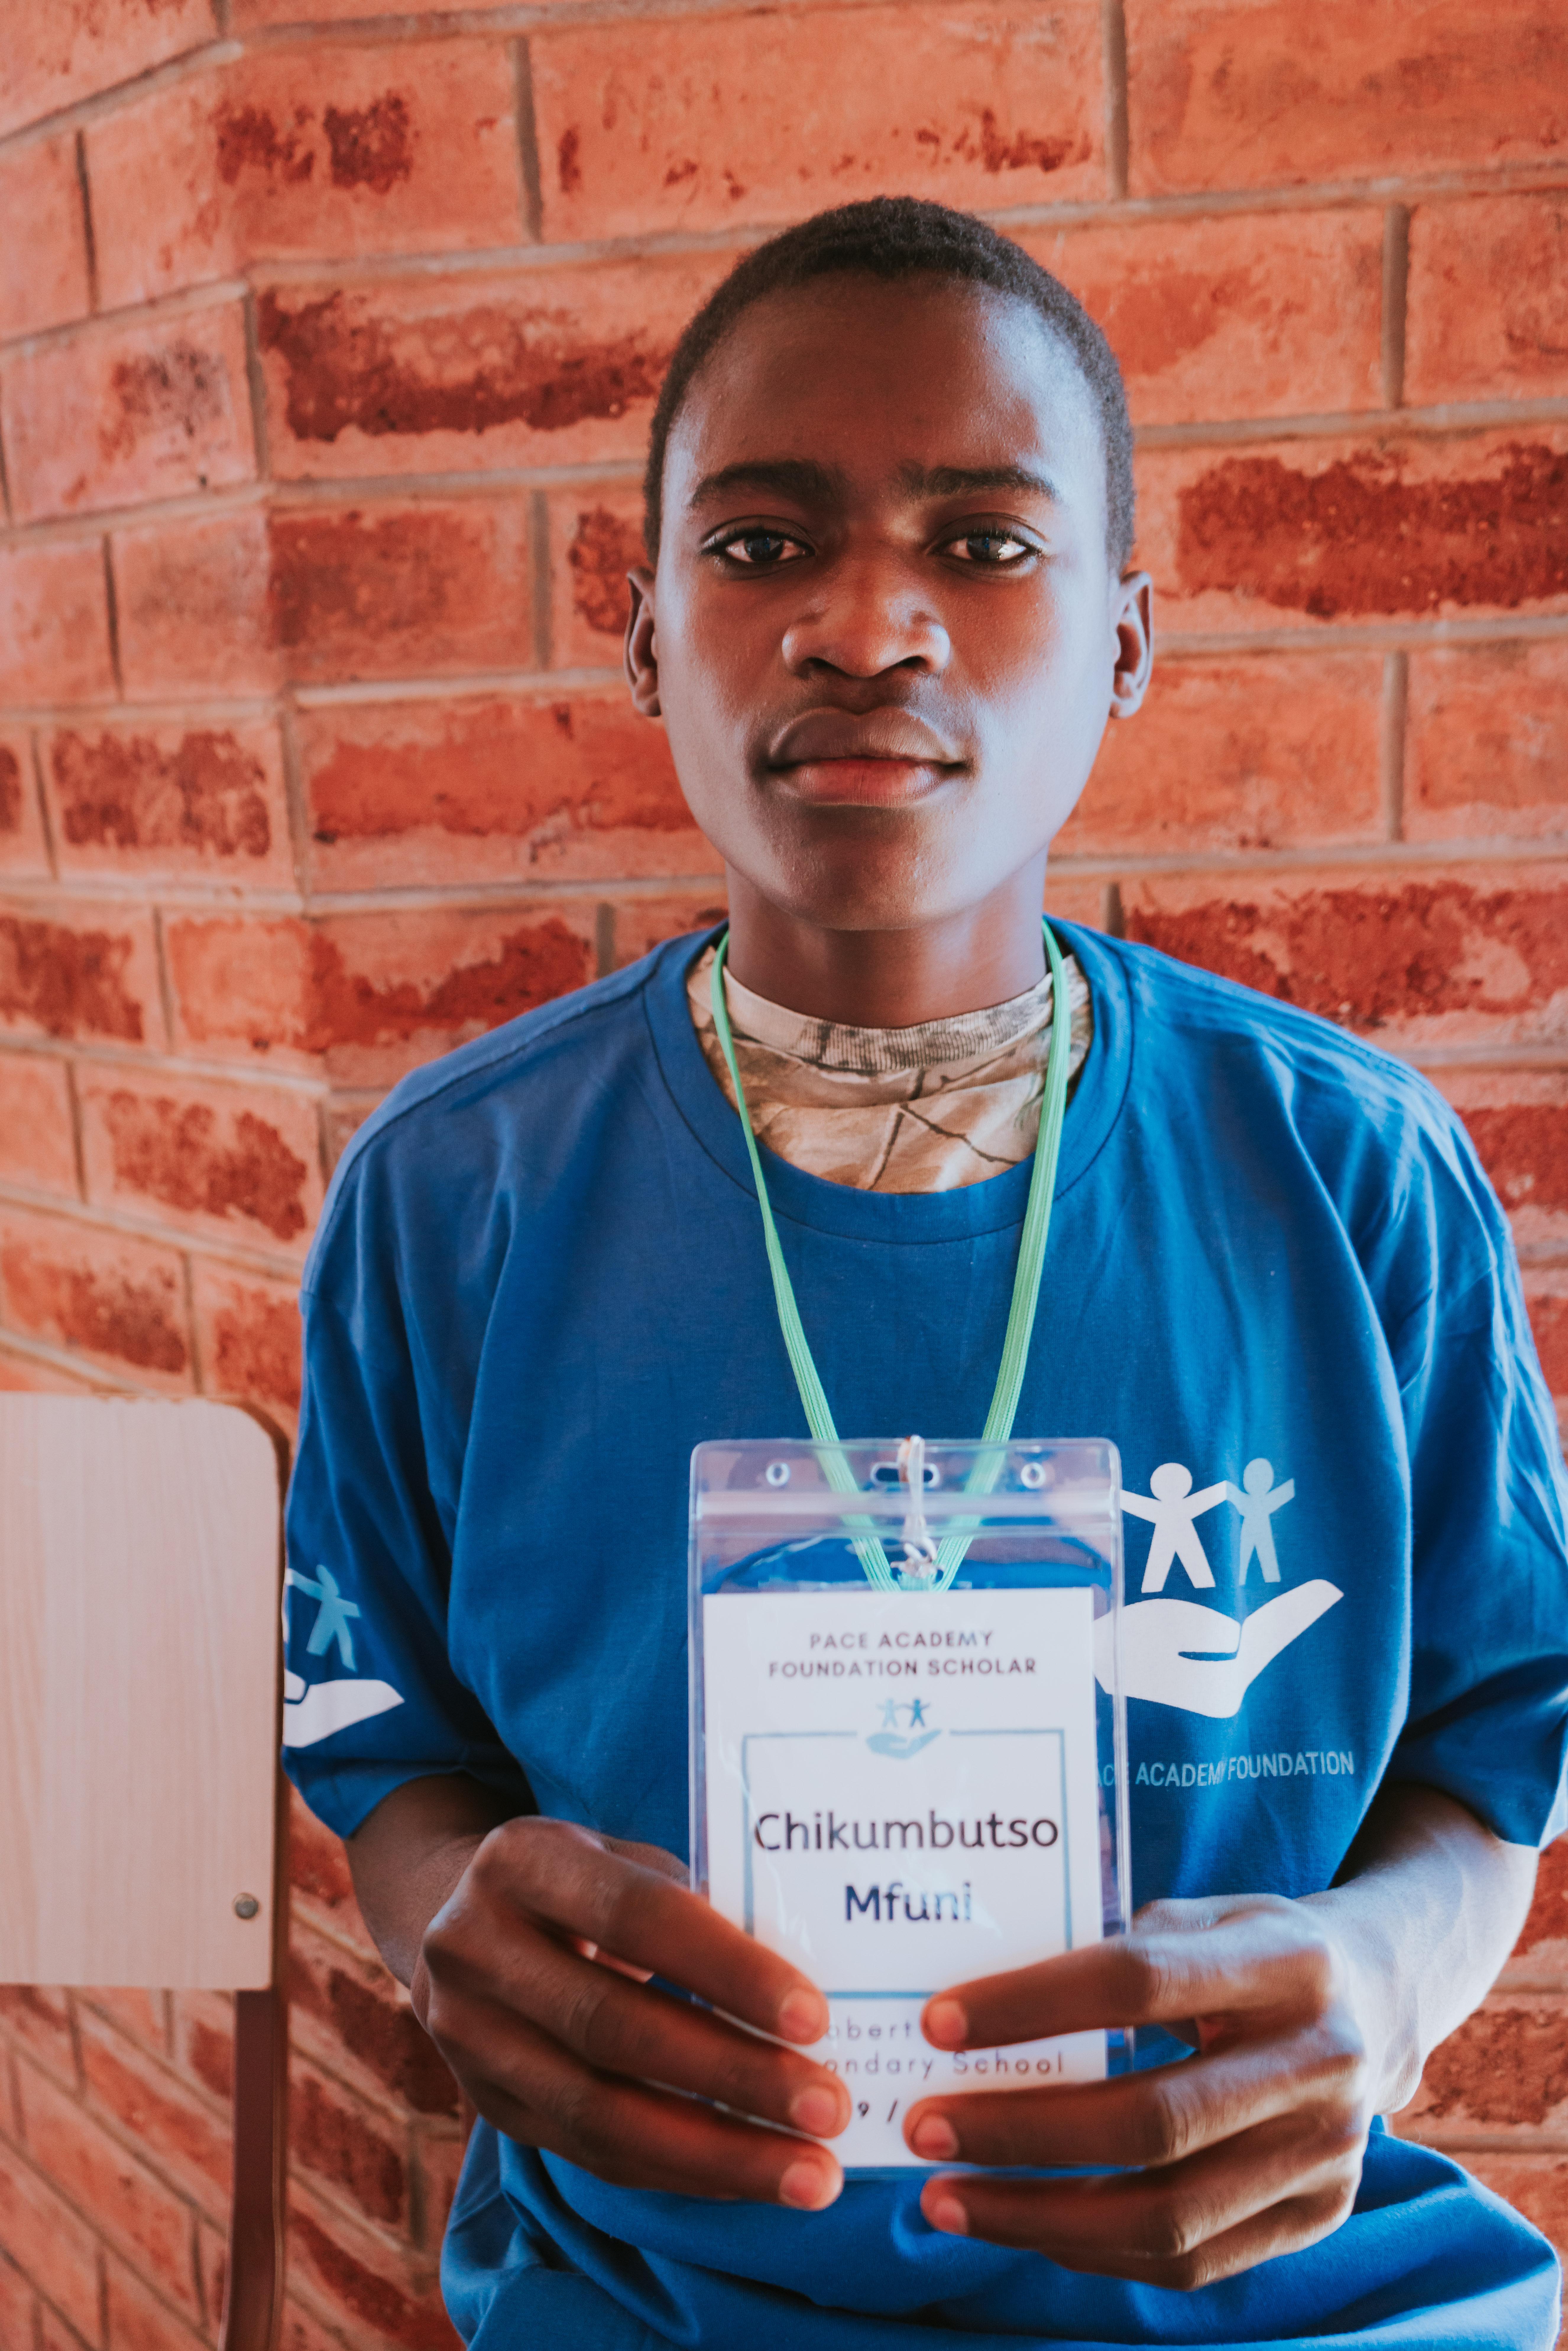 Chikumbutso Mfuni (Robert Blake Secondar